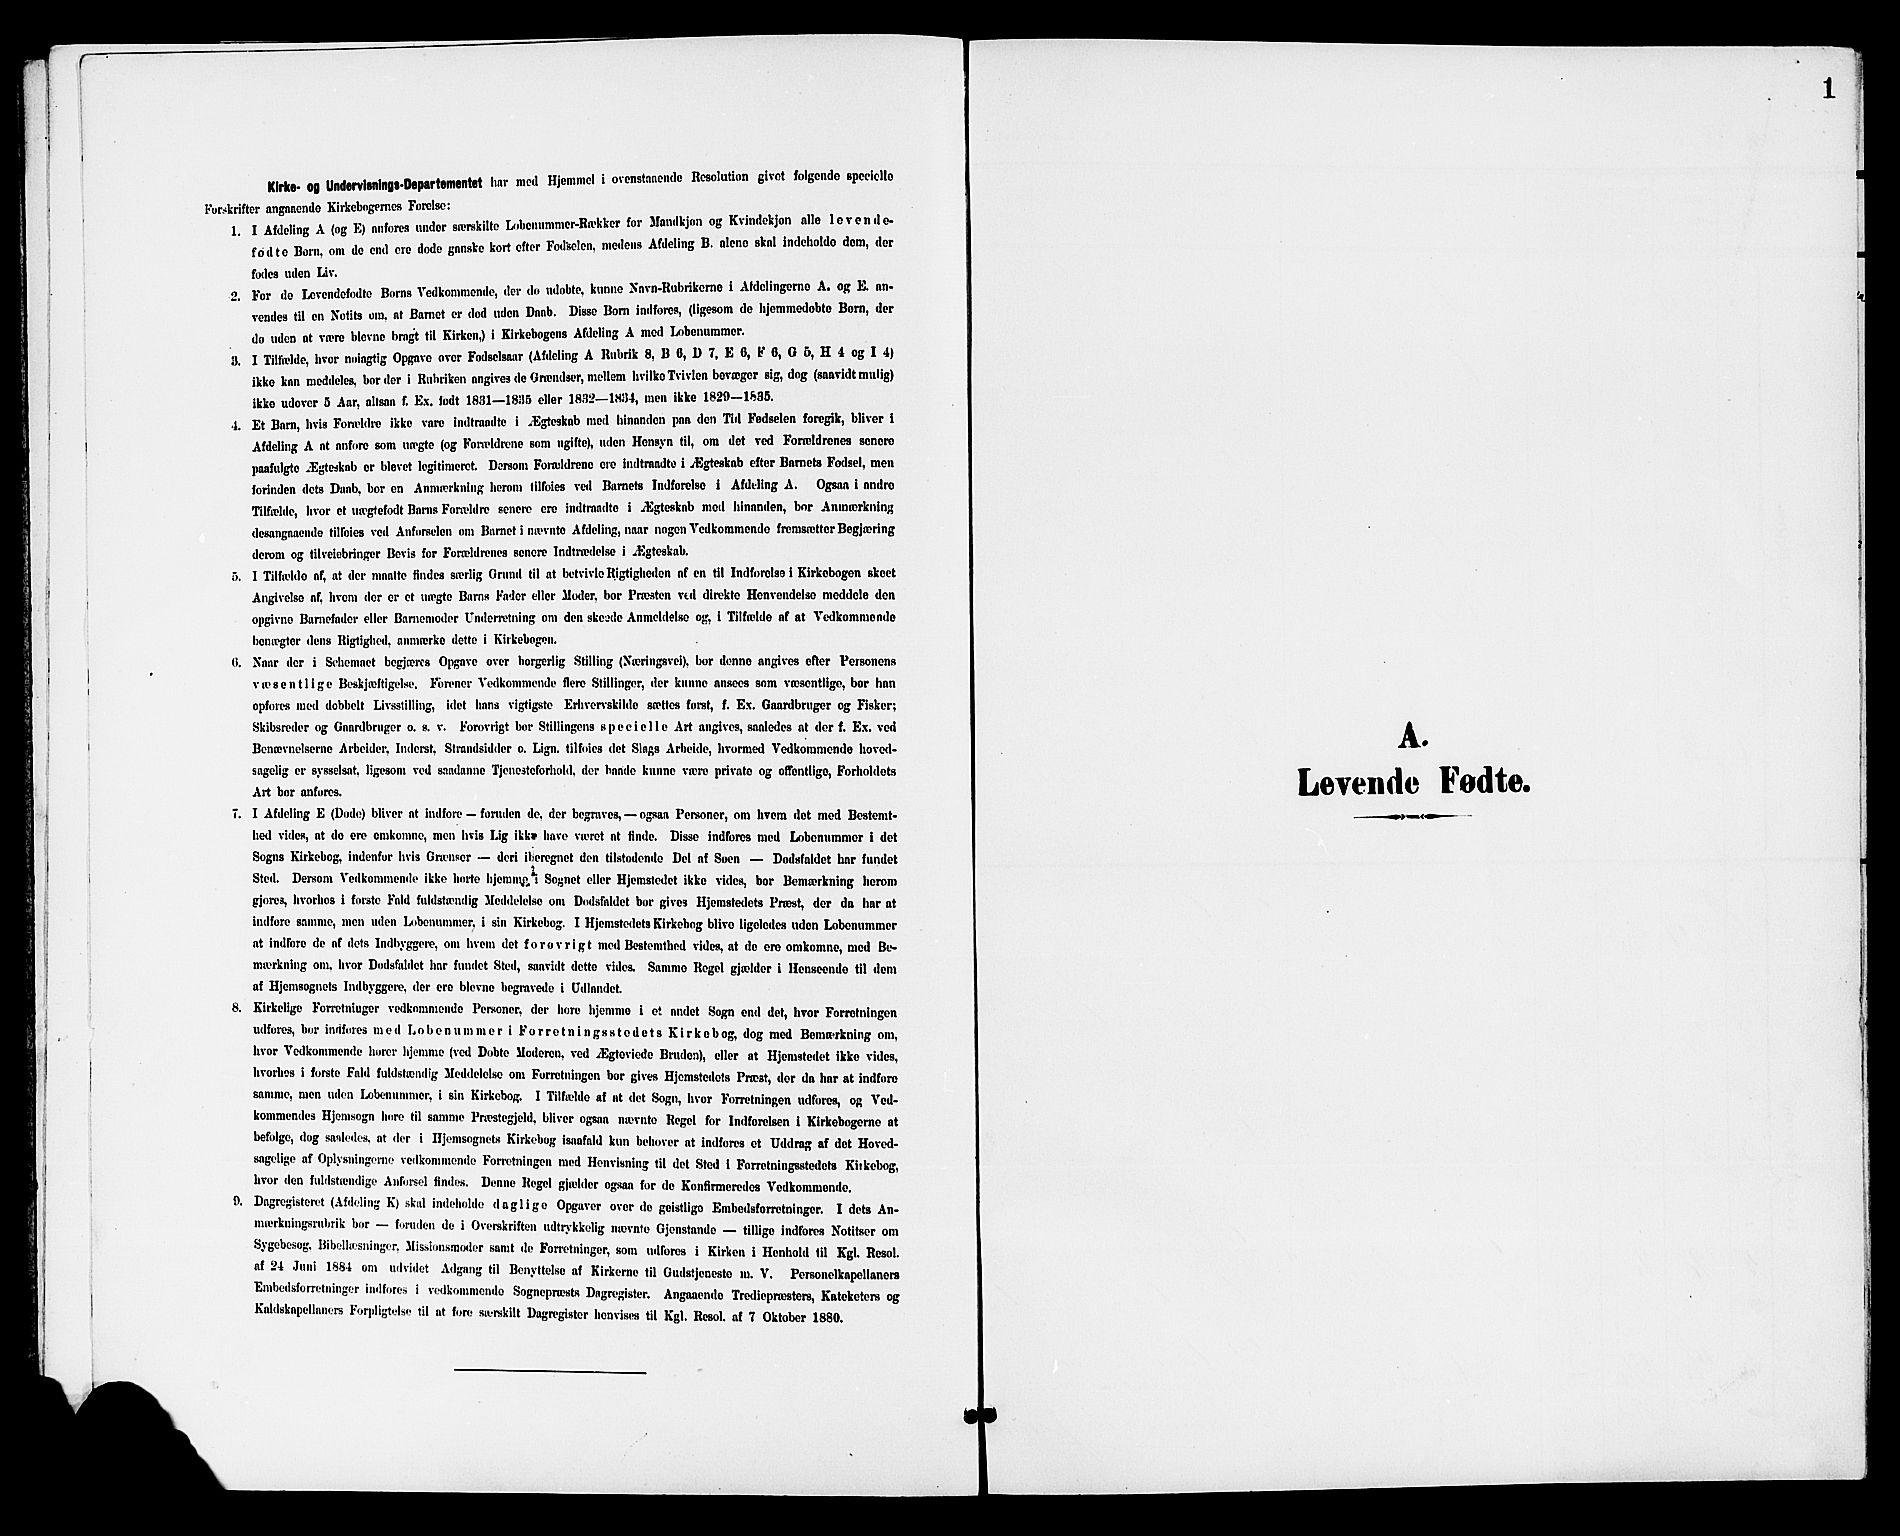 SAKO, Holla kirkebøker, G/Gb/L0002: Klokkerbok nr. II 2, 1897-1913, s. 1